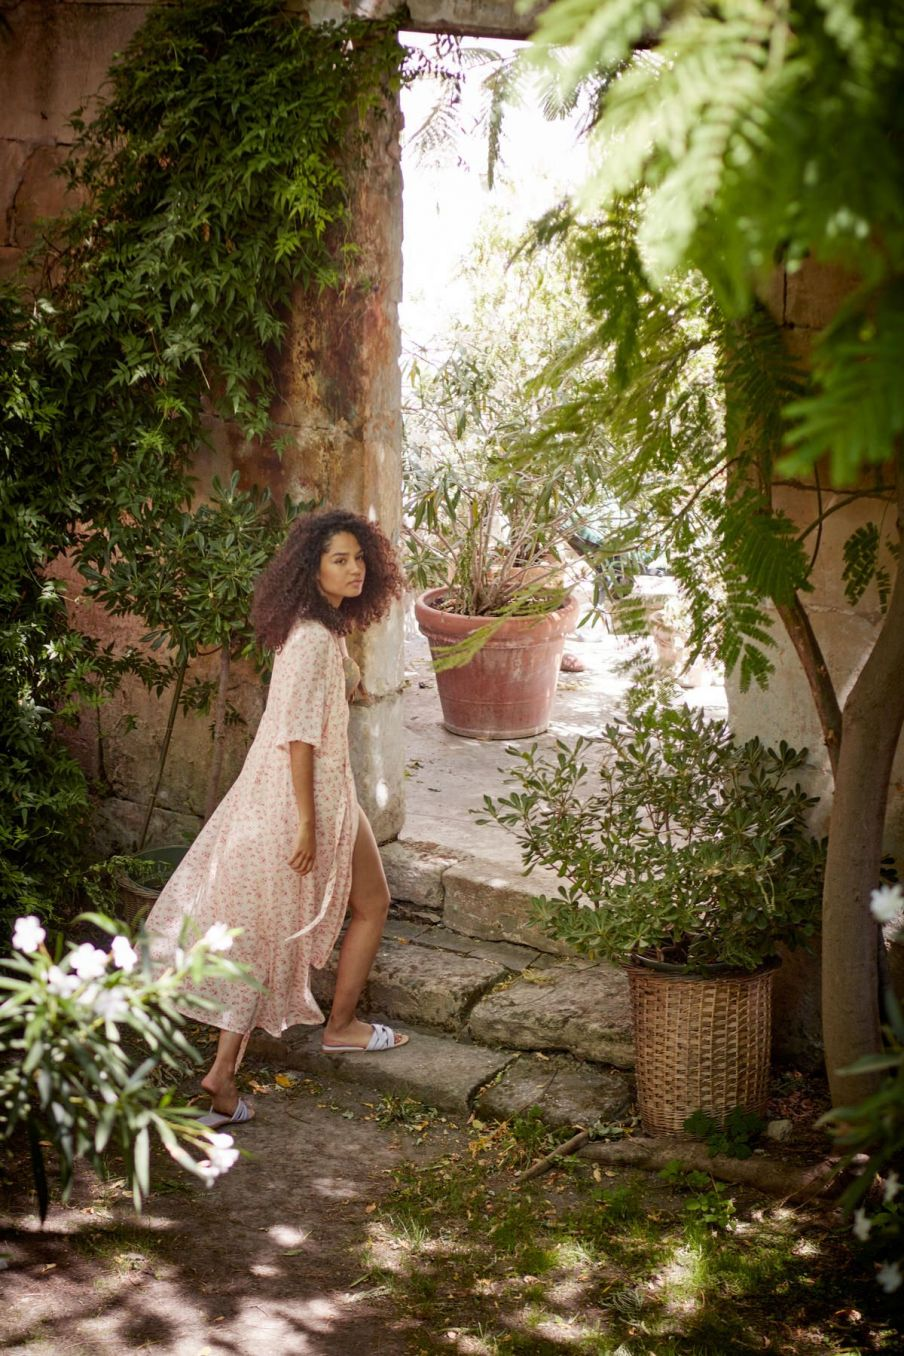 boheme chic vintage robe femme steria cream blossom